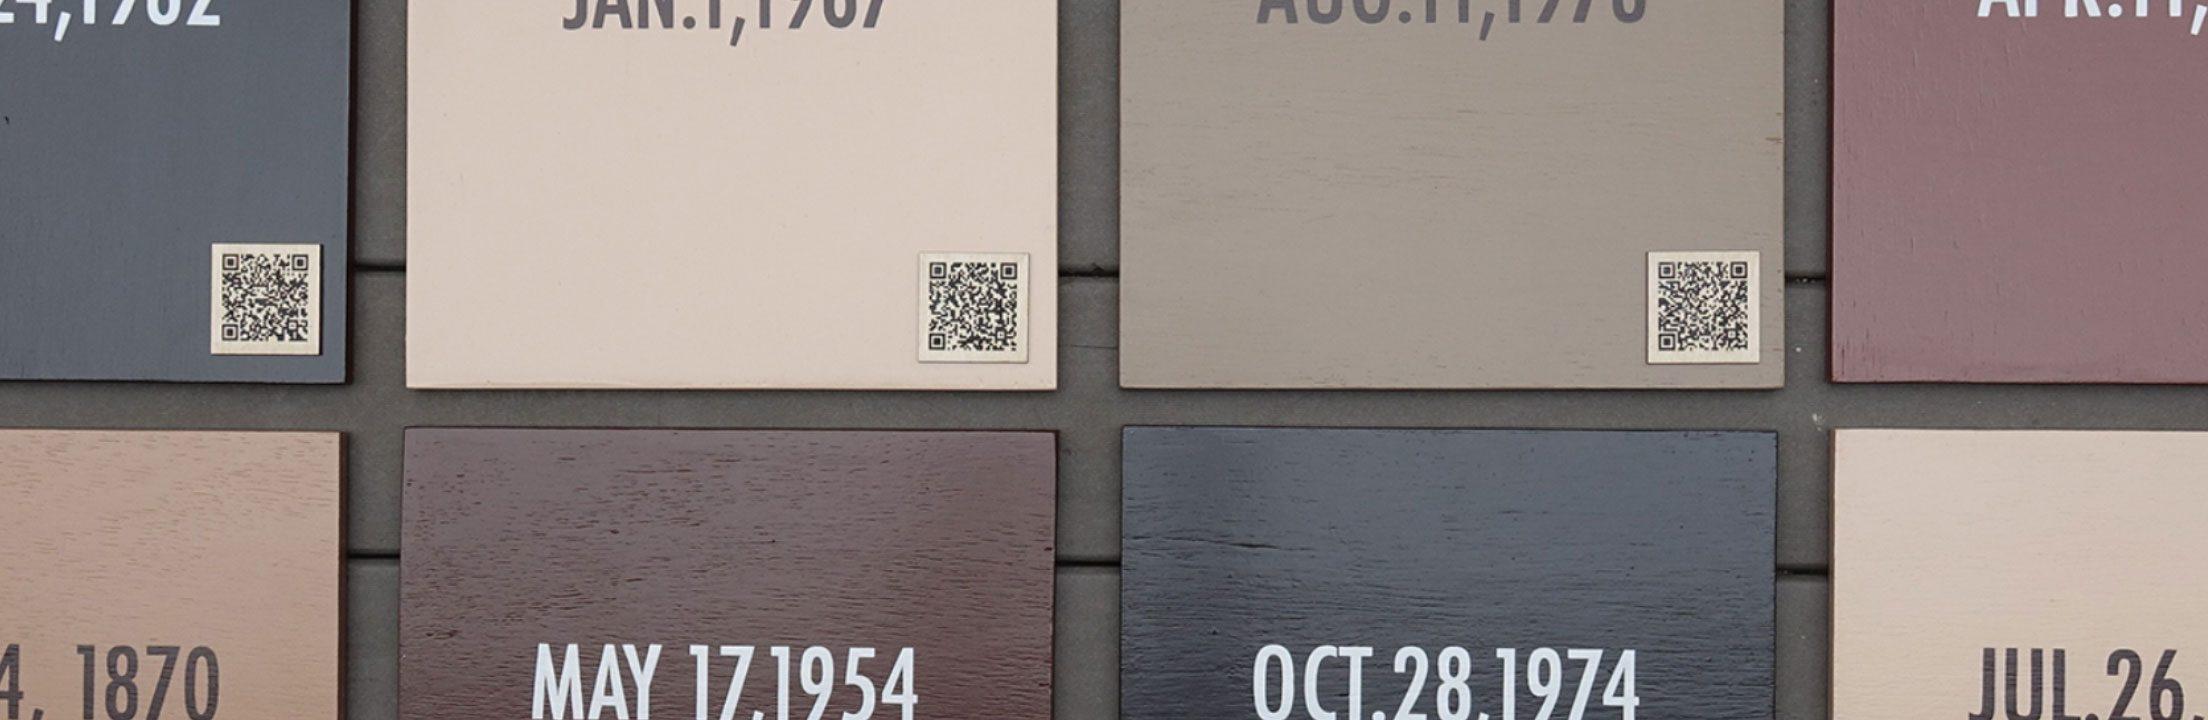 Blocks of text